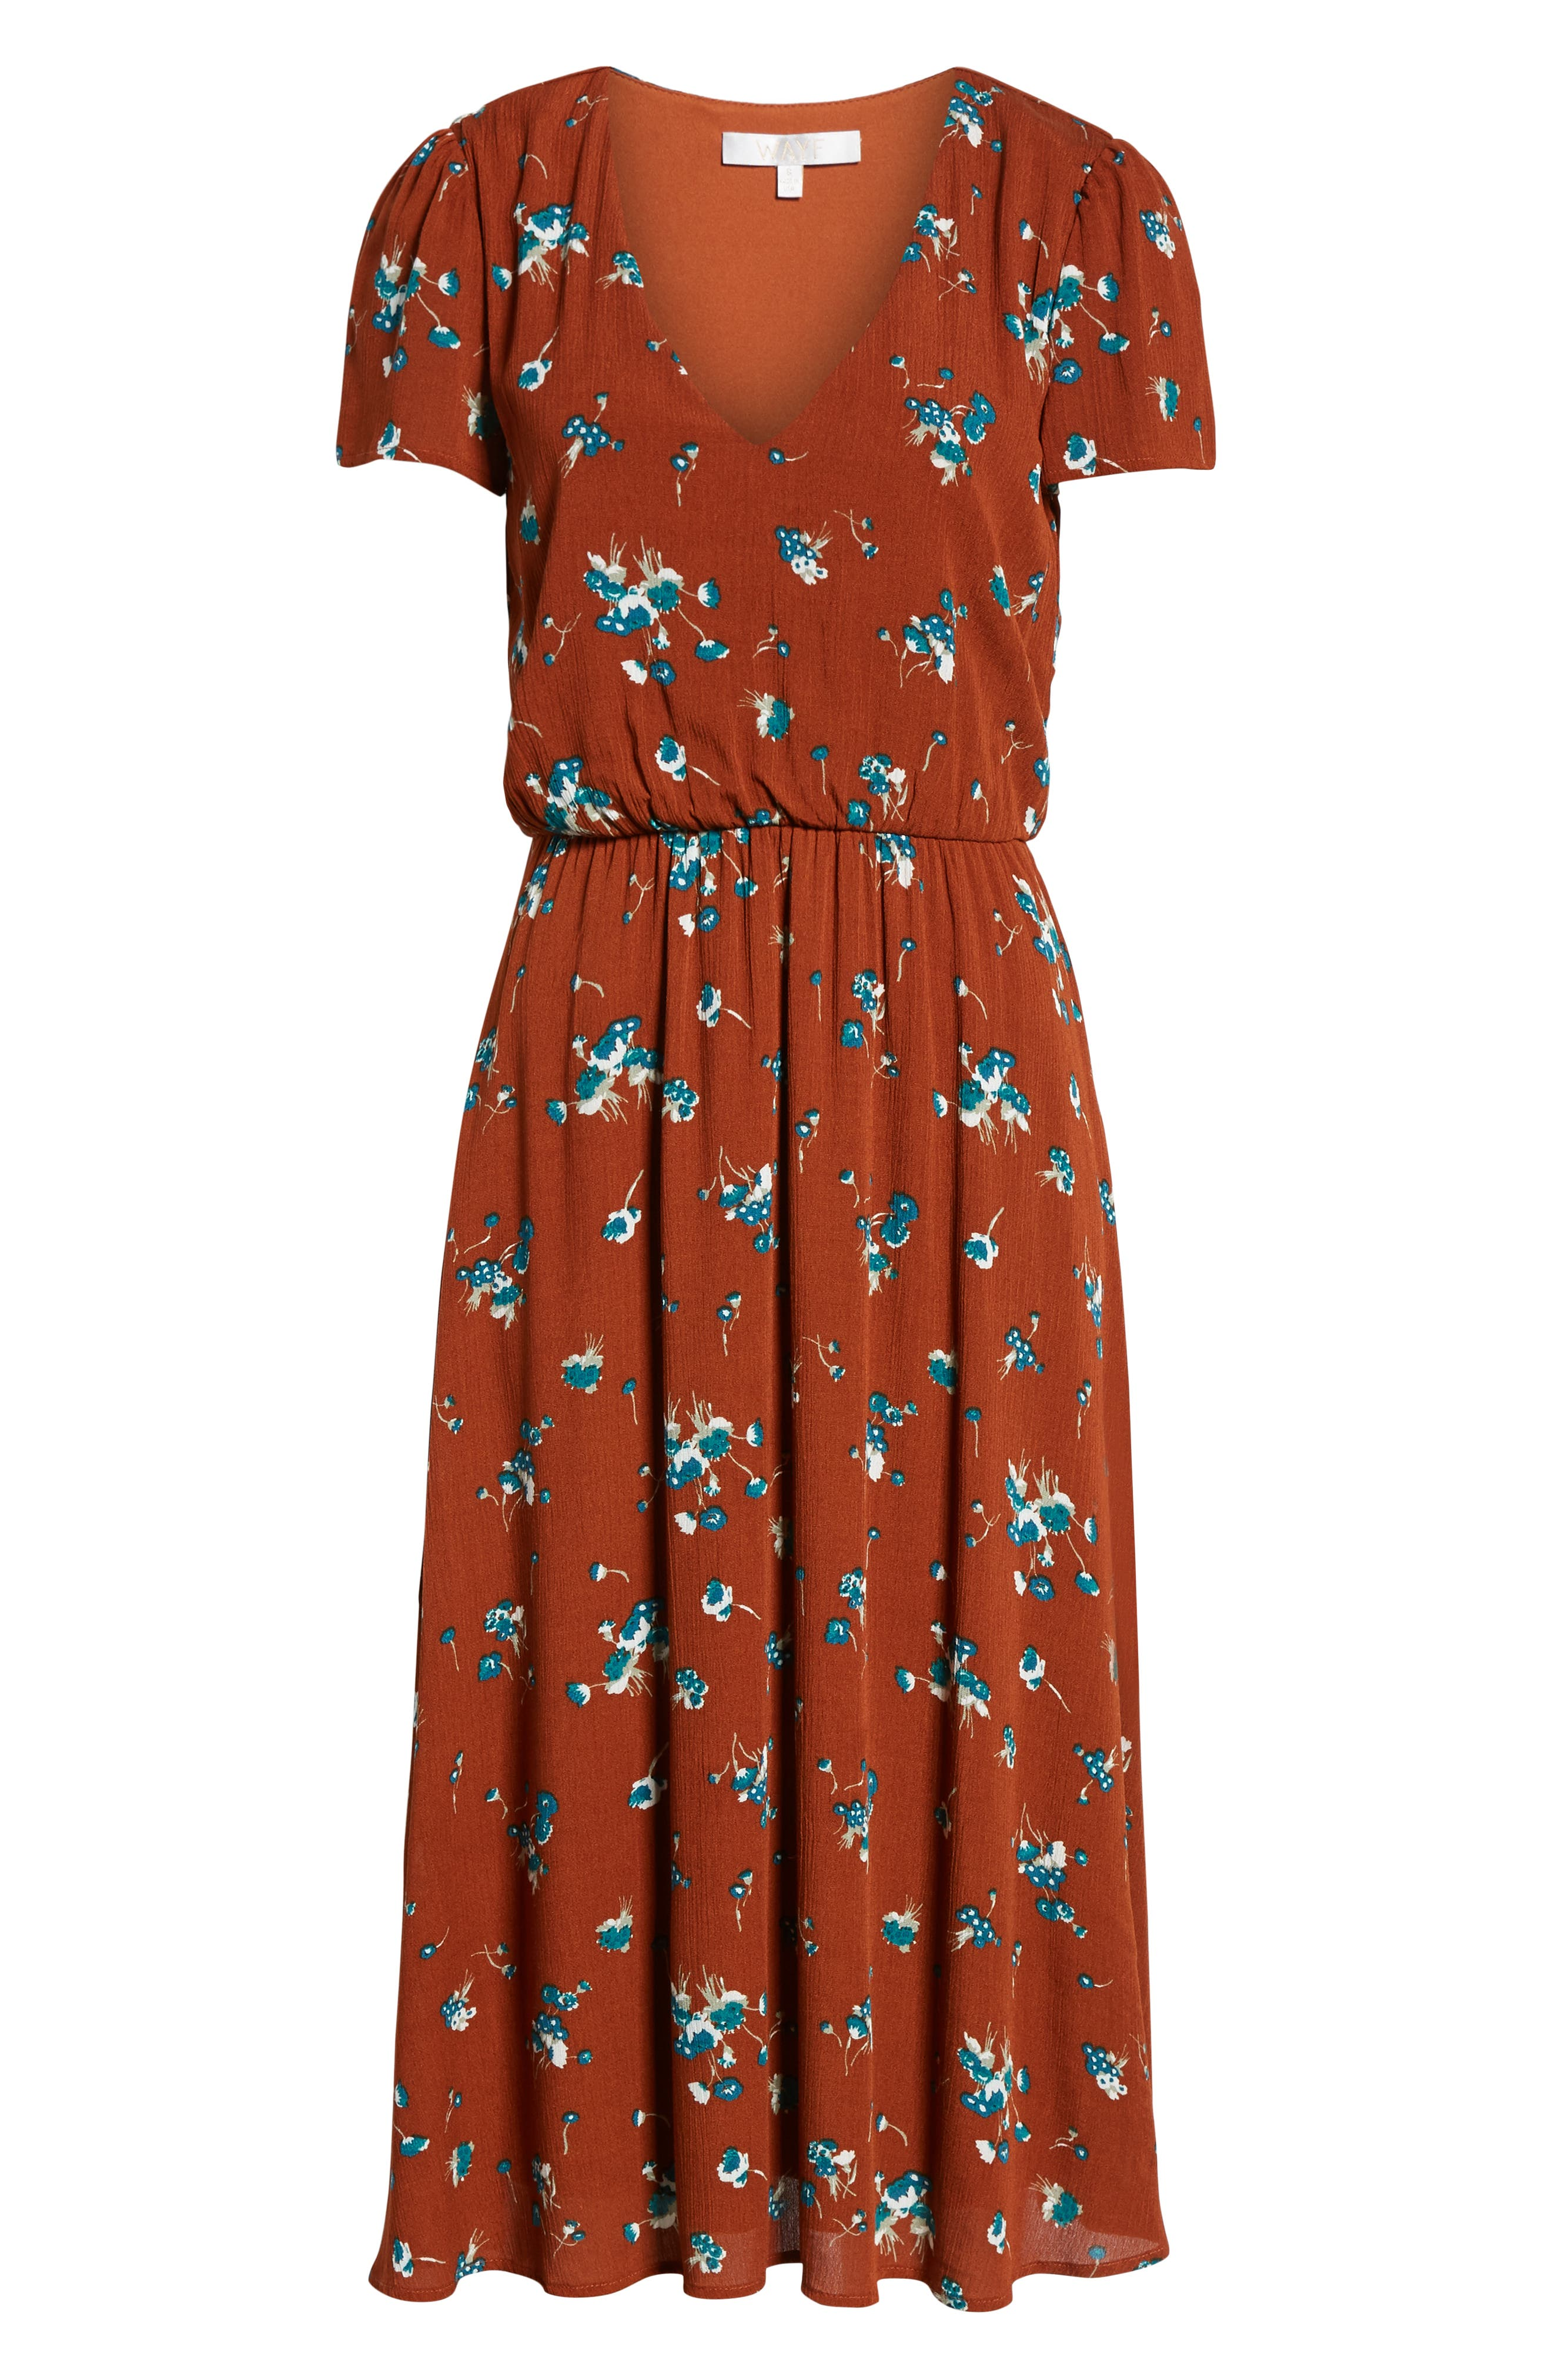 Blouson Midi Dress,                             Alternate thumbnail 7, color,                             BROWN SPICE FLORAL